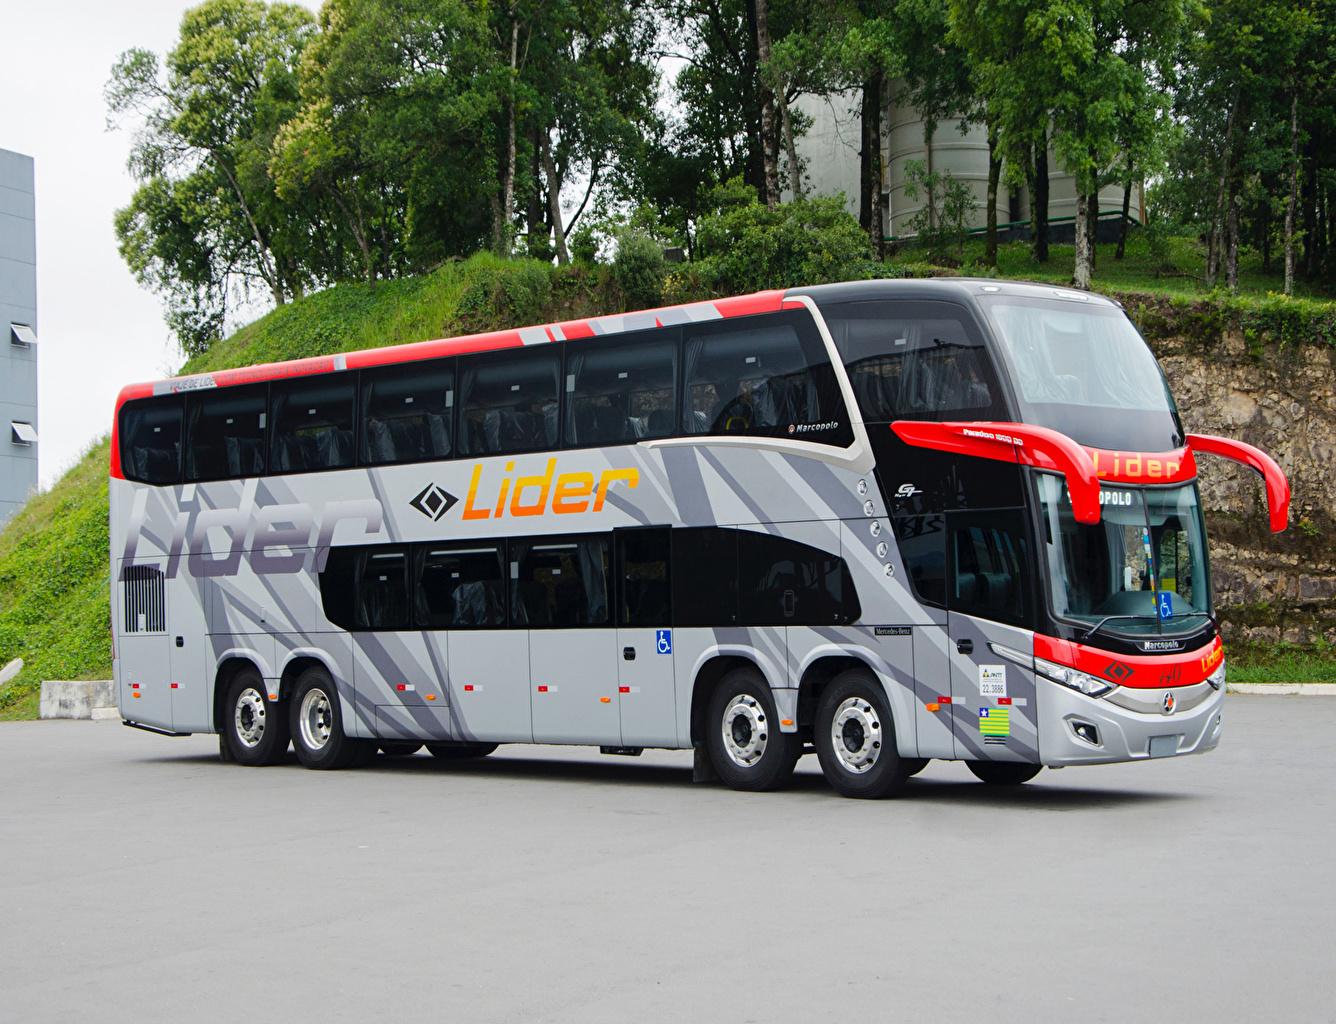 Mercedes-Benz_Bus_564968_1336x1024.jpg